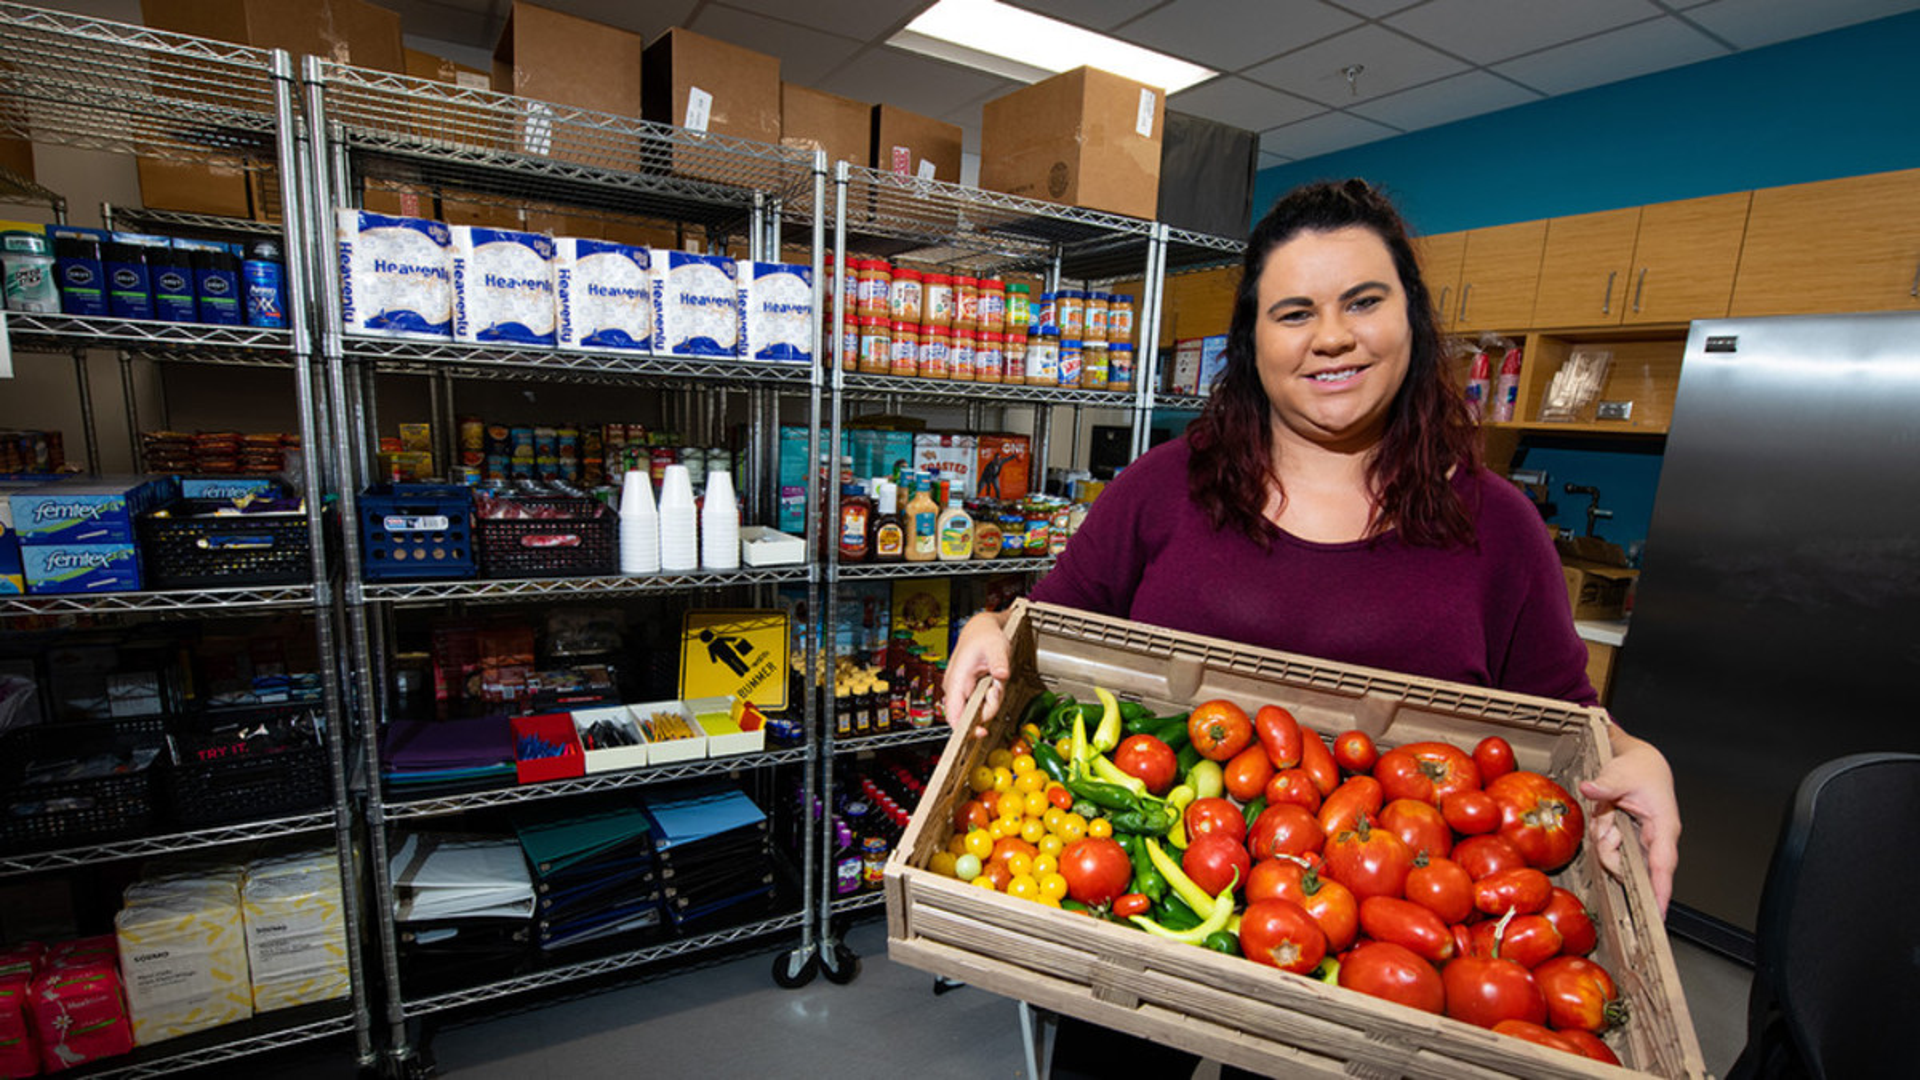 Husker Pantry seeks 1,500 items to restock shelves